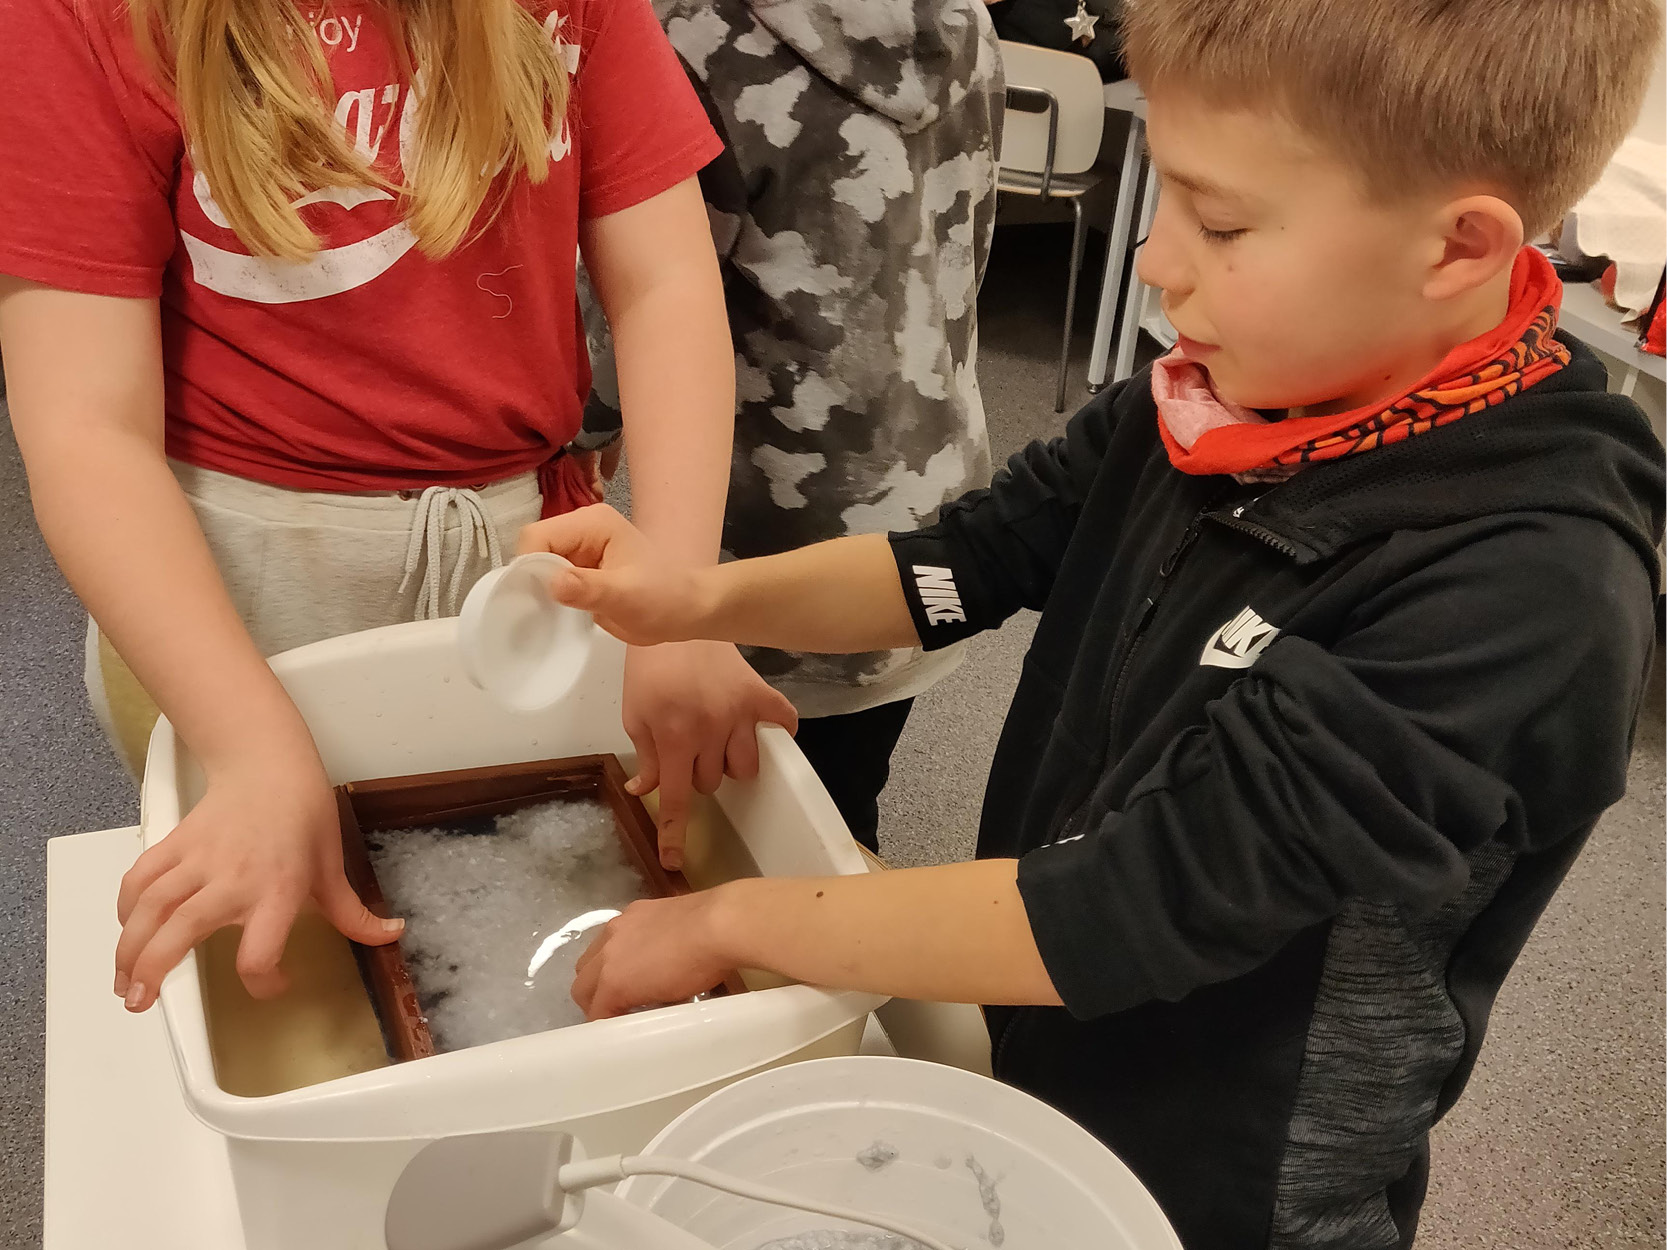 Pojke skopar pappersmassa i en ram